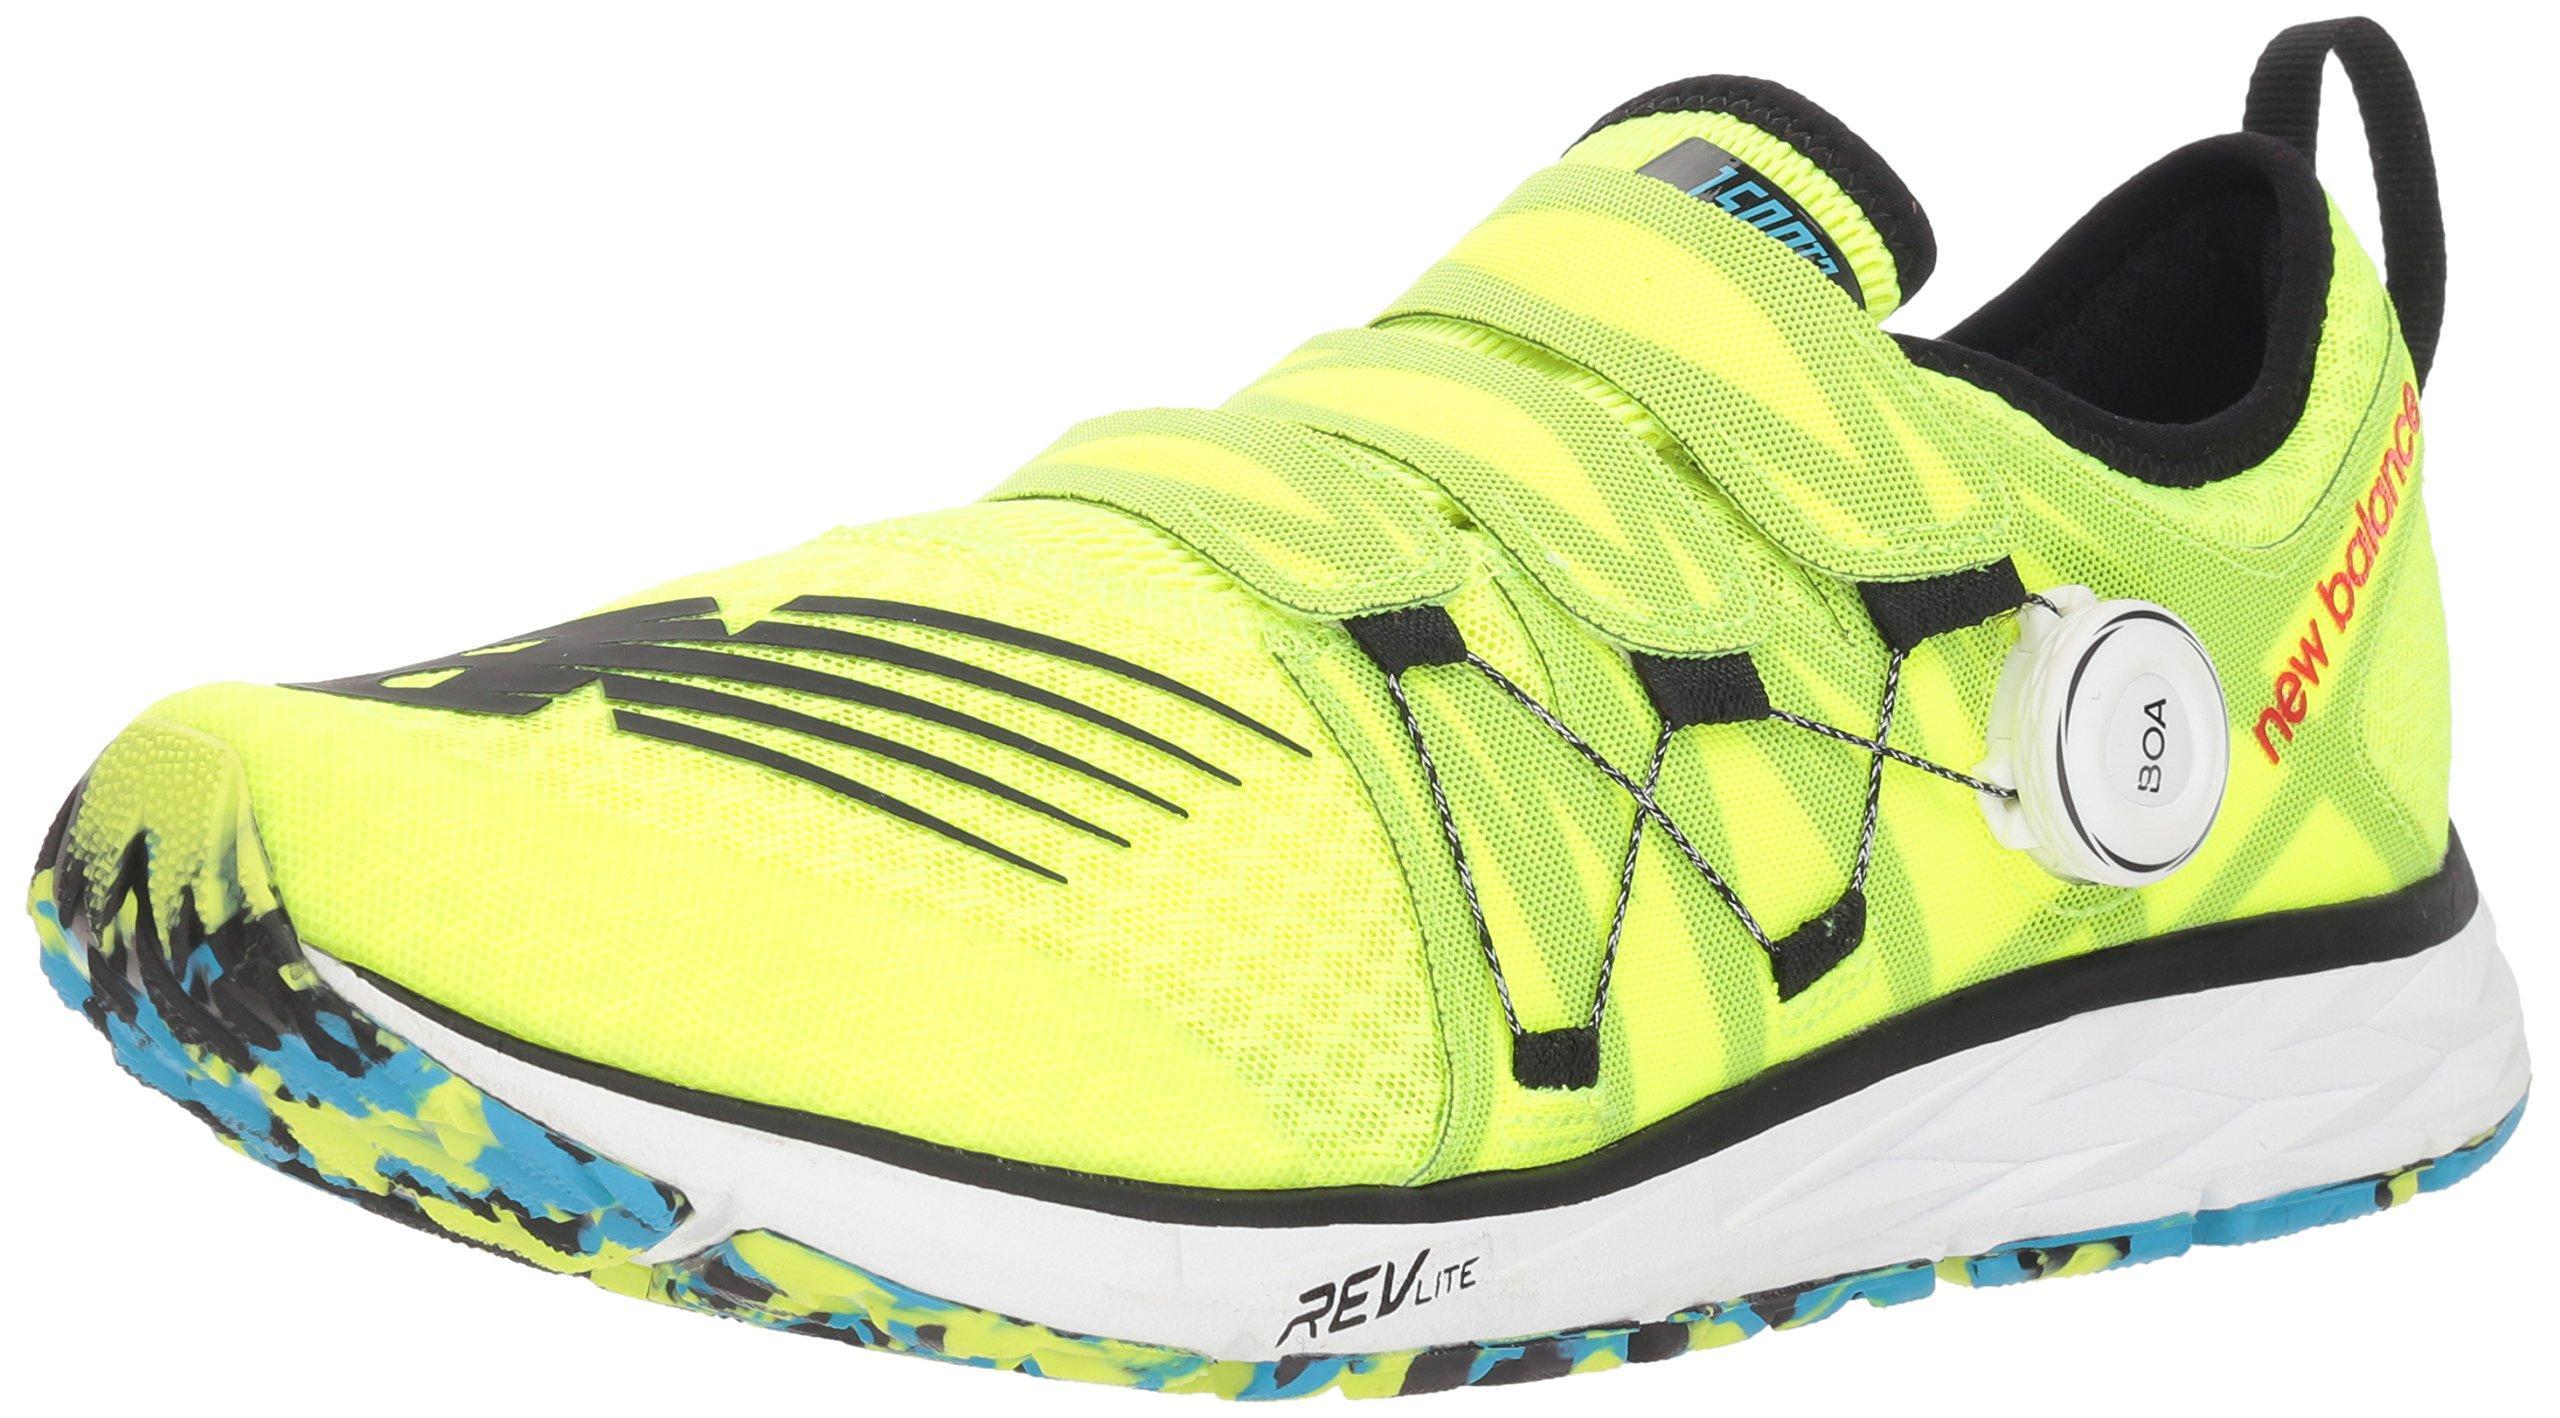 New Balance 1500 V4 Boa Running Shoe in Yellow/Black (Yellow) for ...